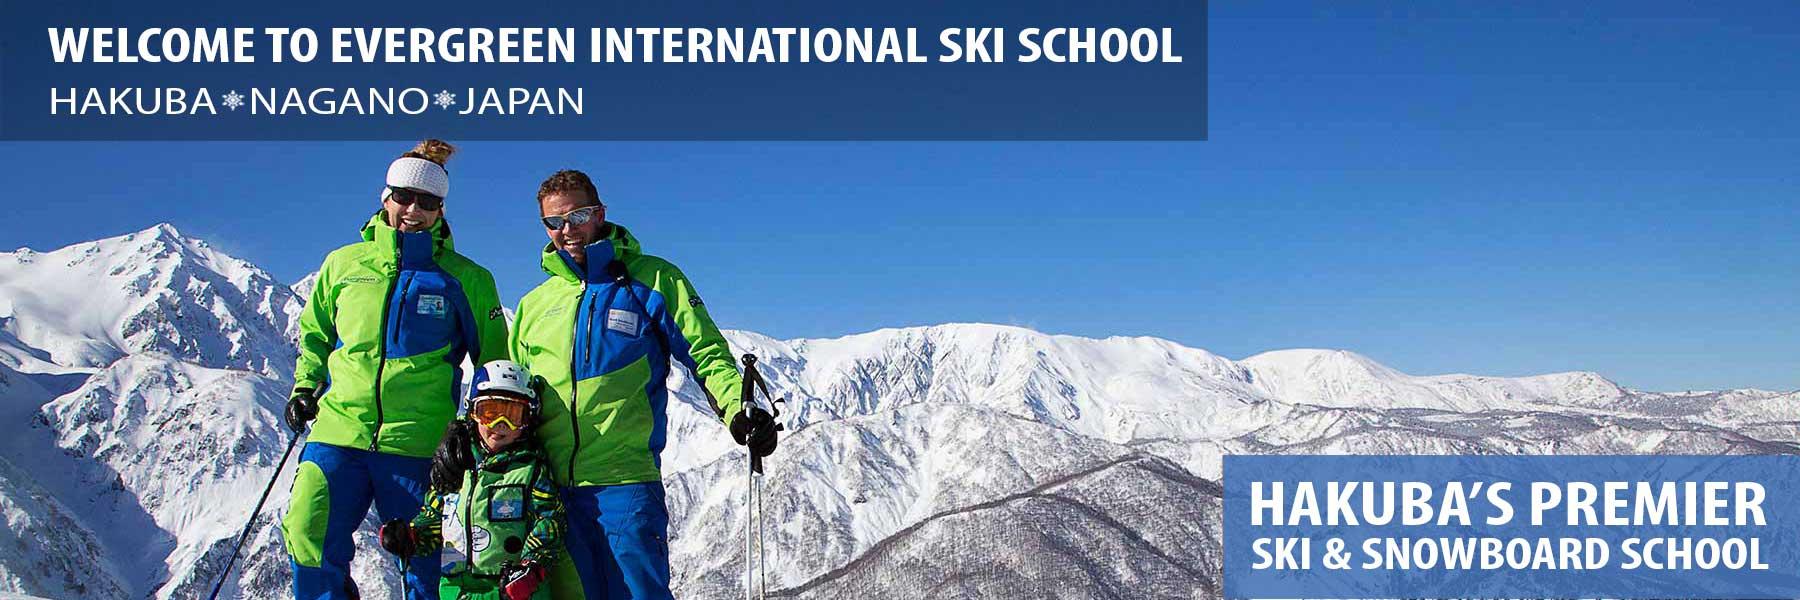 japan ski school header - private lessons